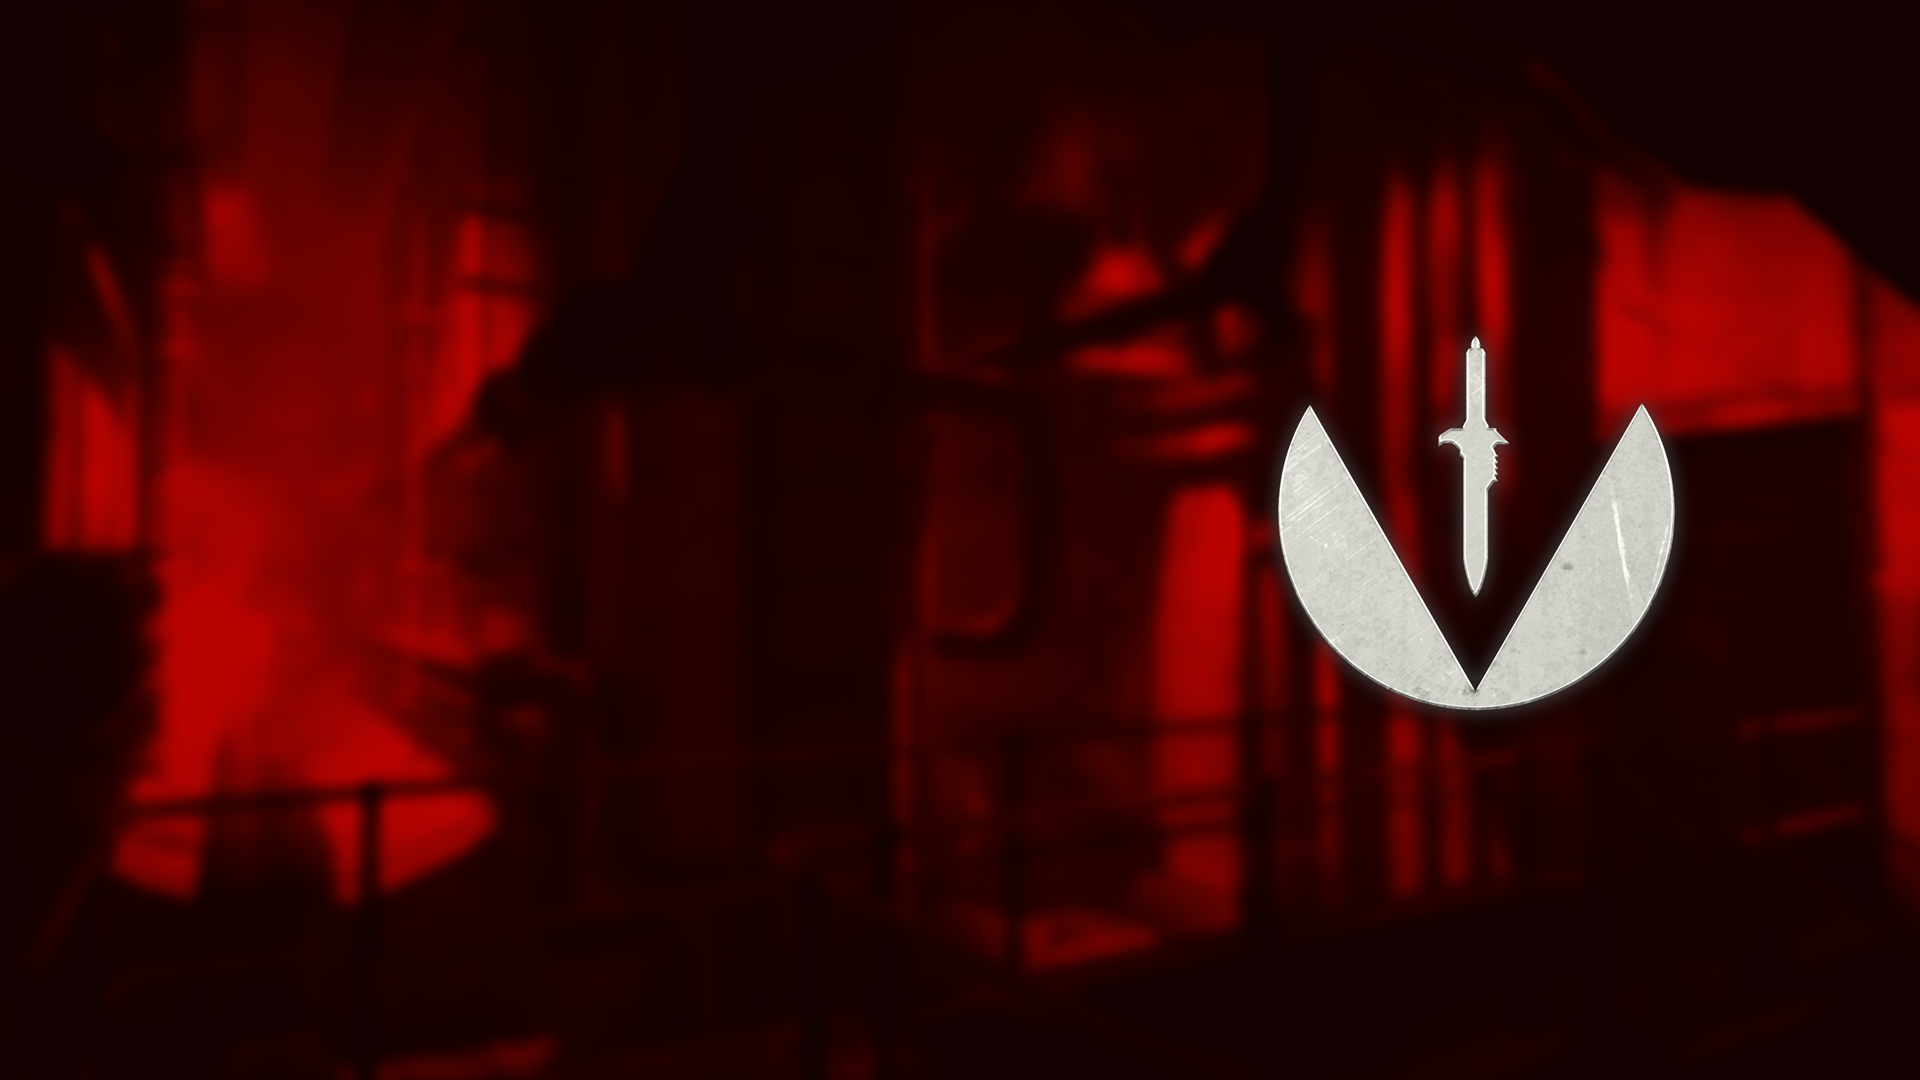 Icon for Knife sheath +